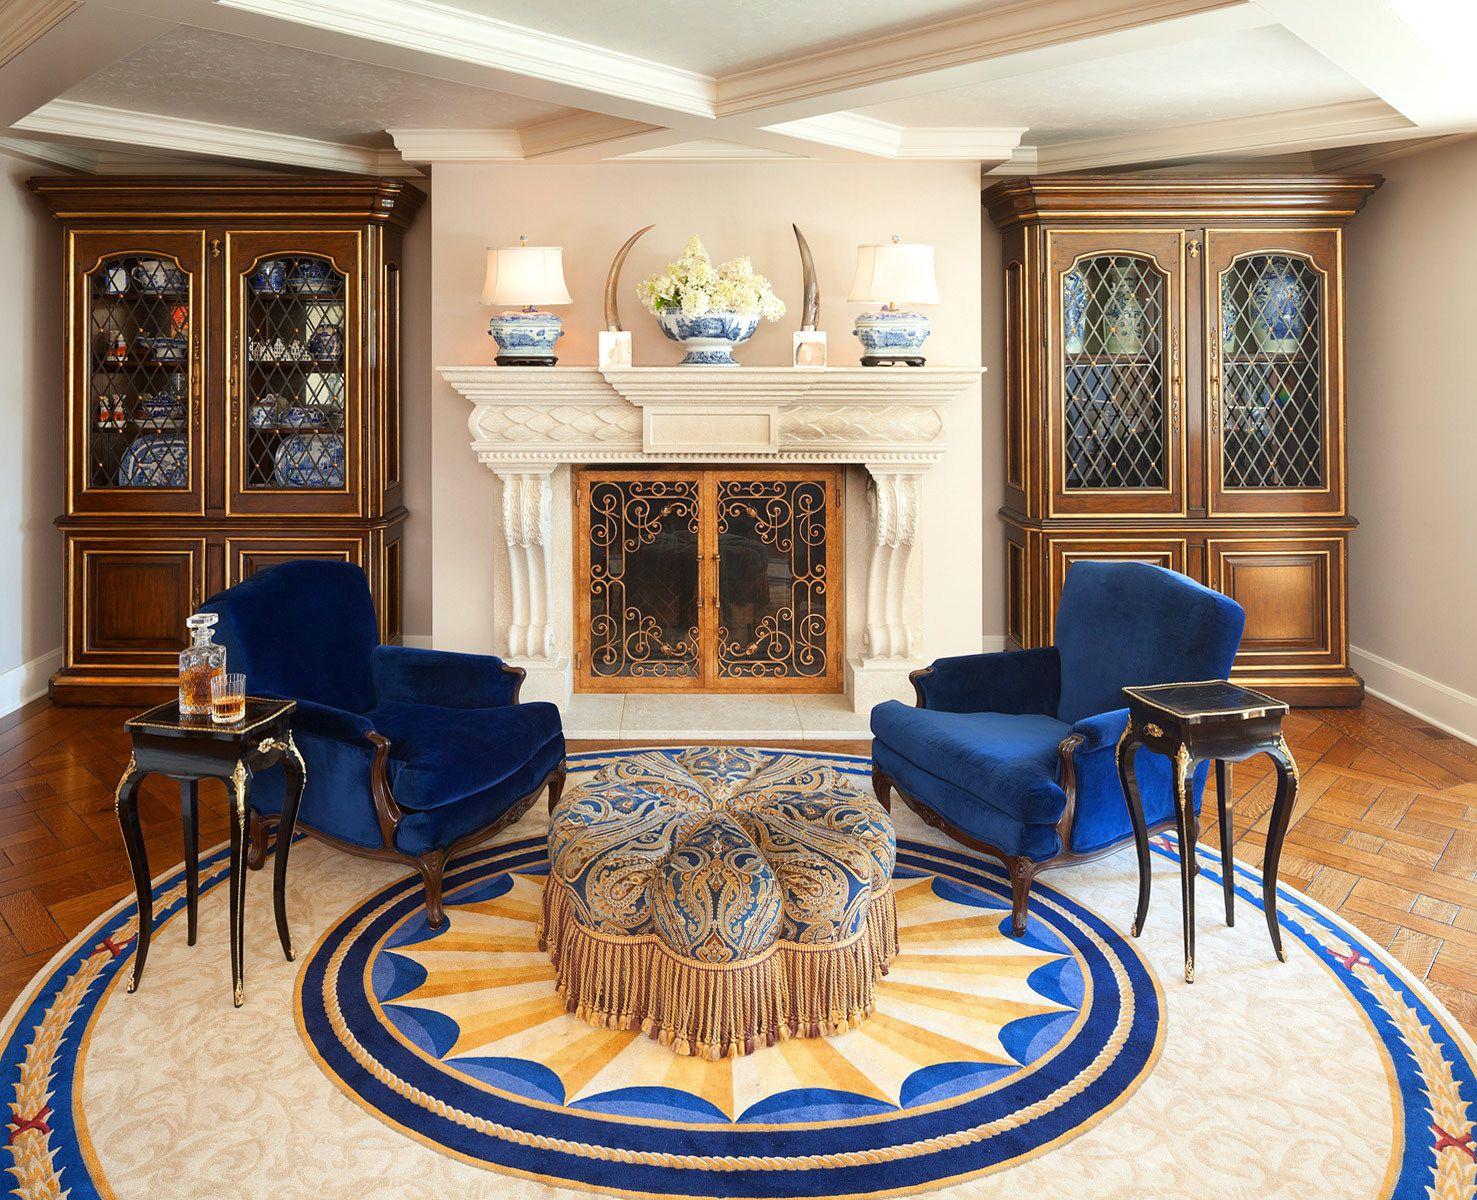 1blue_sitting_room_stone_fireplace.jpg